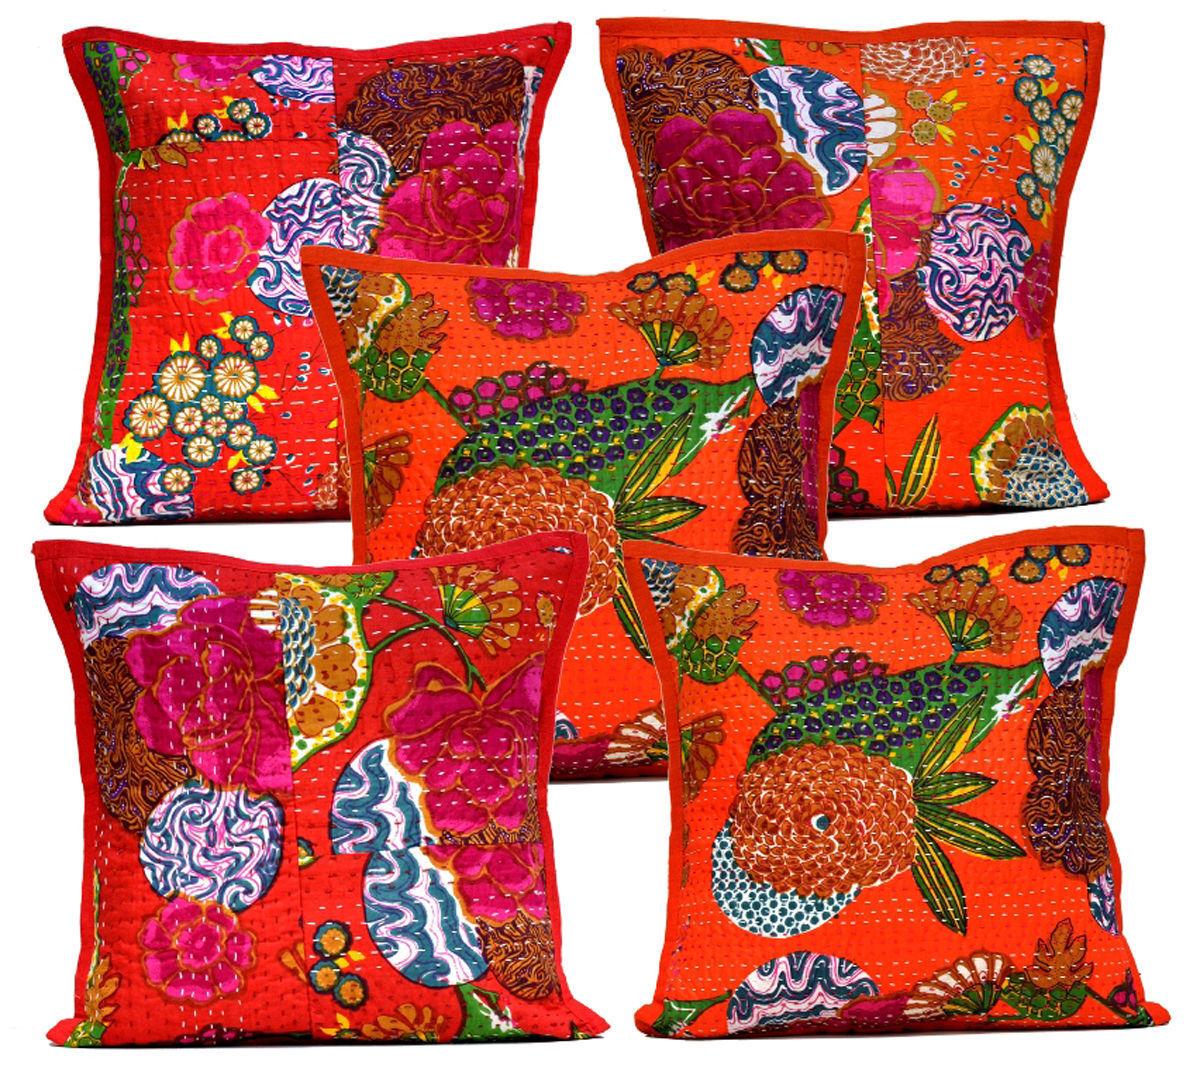 10Pcs Home Decorative Kantha Stitch Floral orange Pillow Cushion Covers AIC803